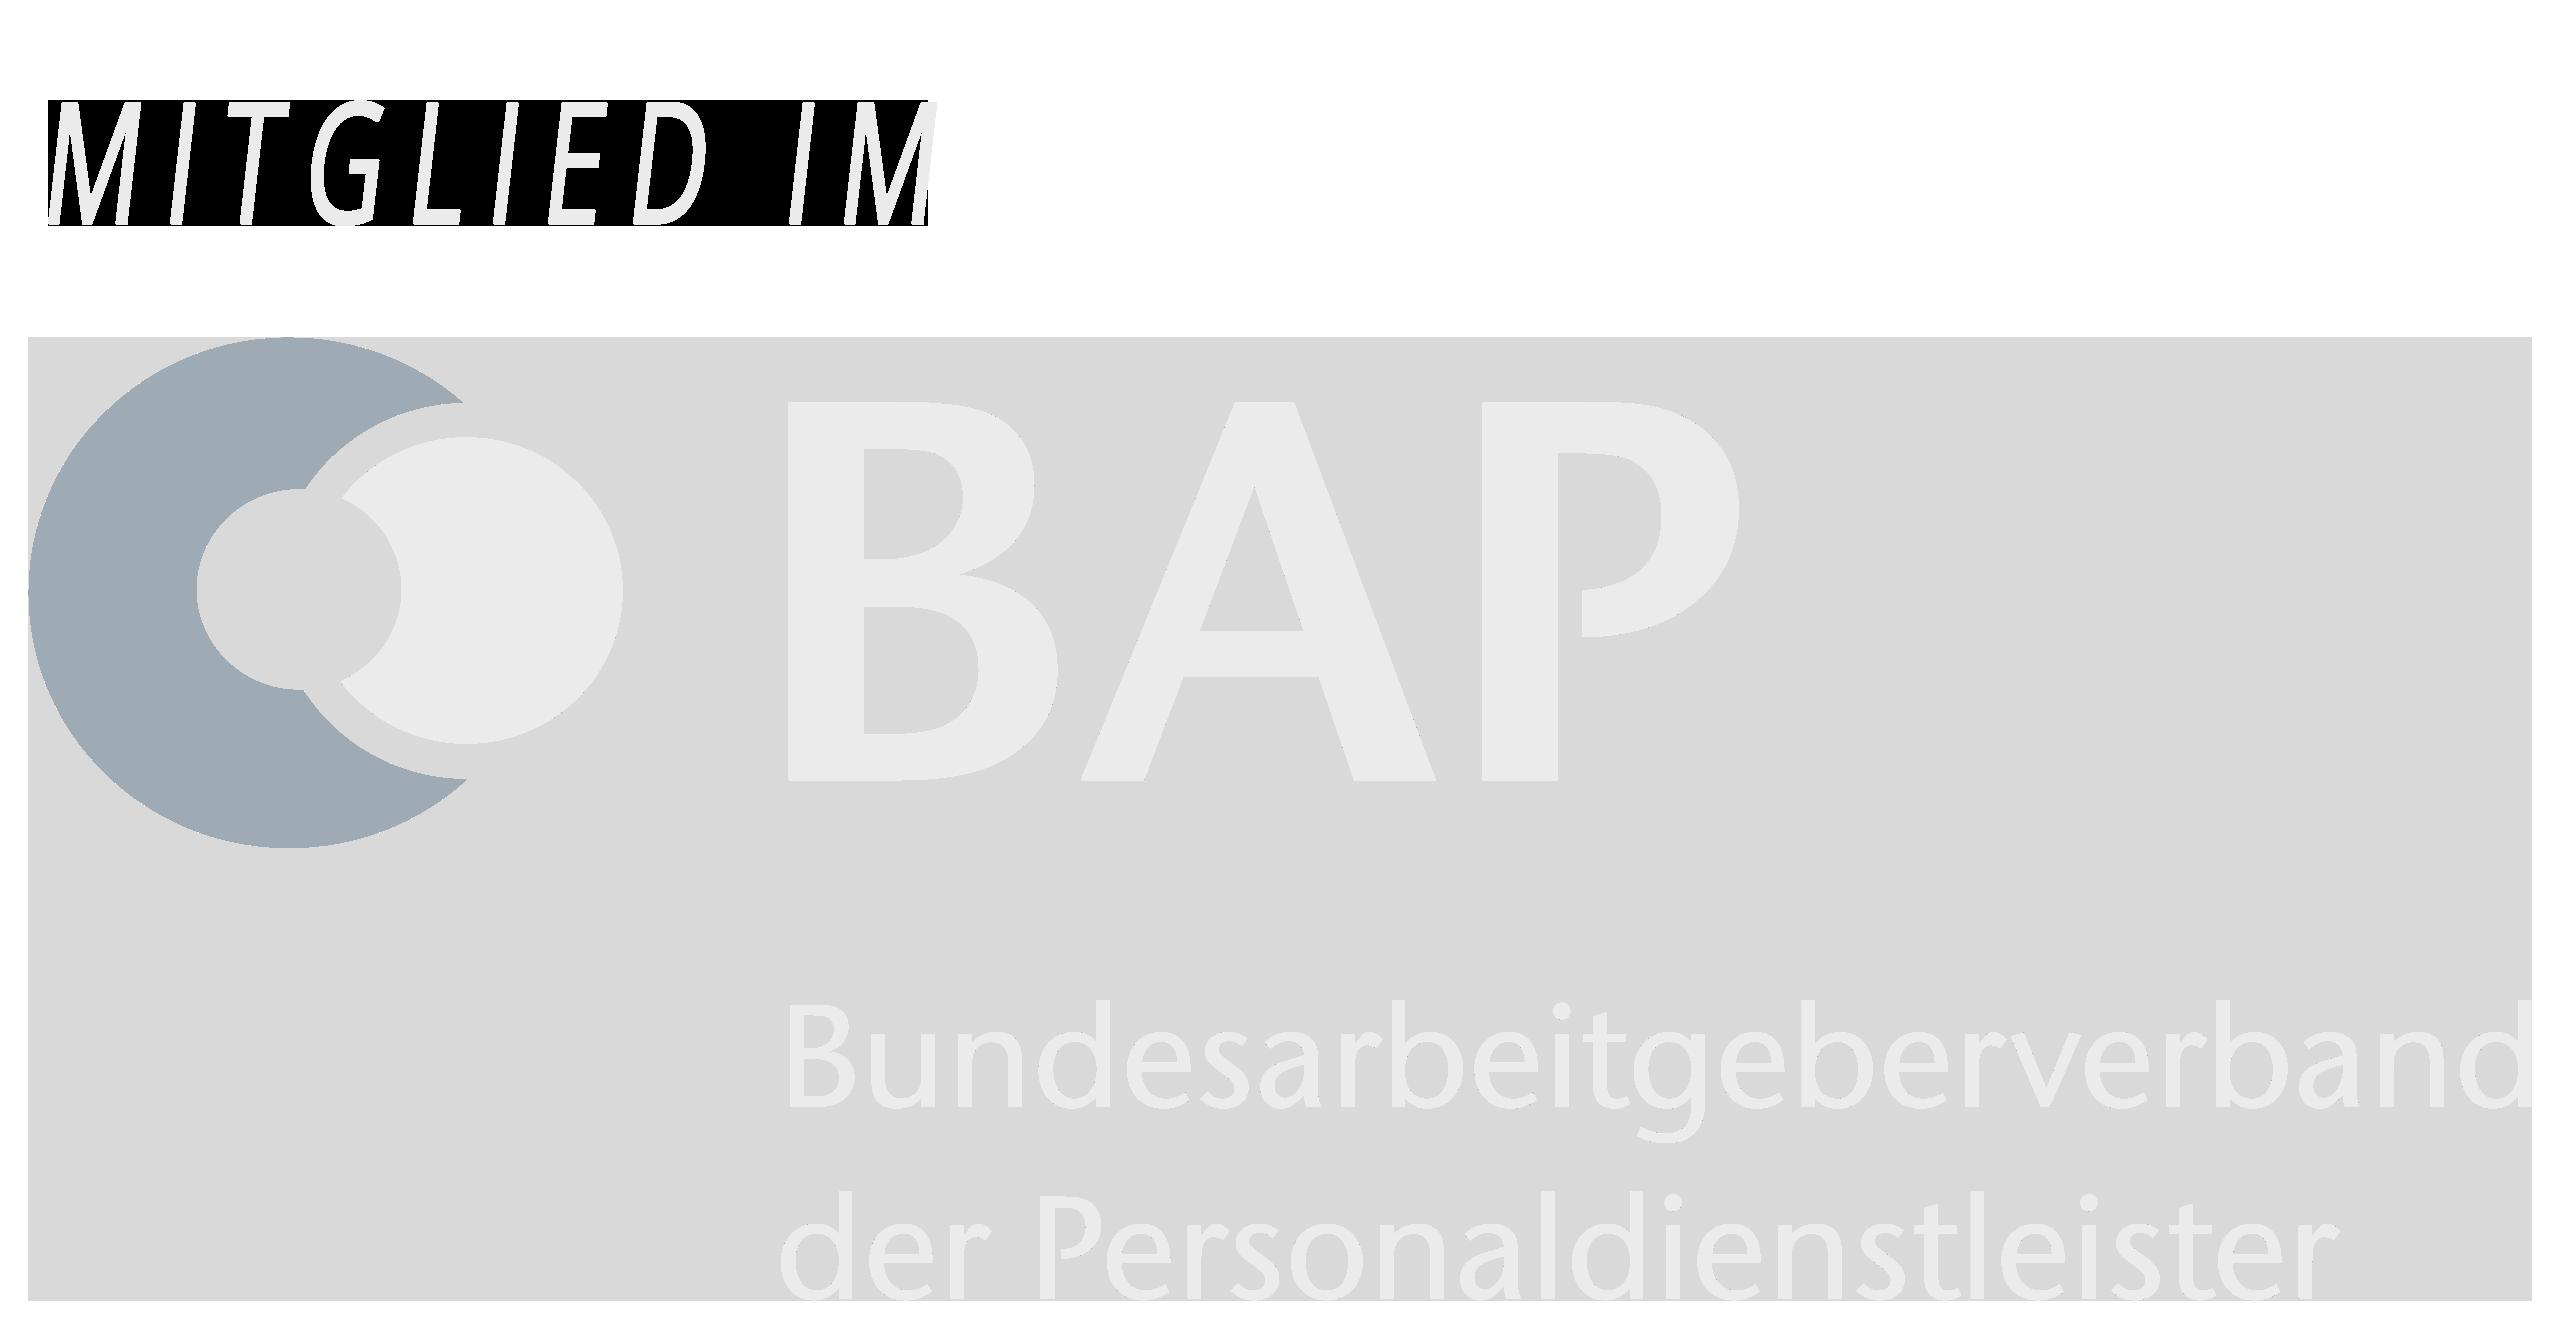 https://www.ant-personalkonzept.de/wp-content/uploads/2019/06/bagv.png